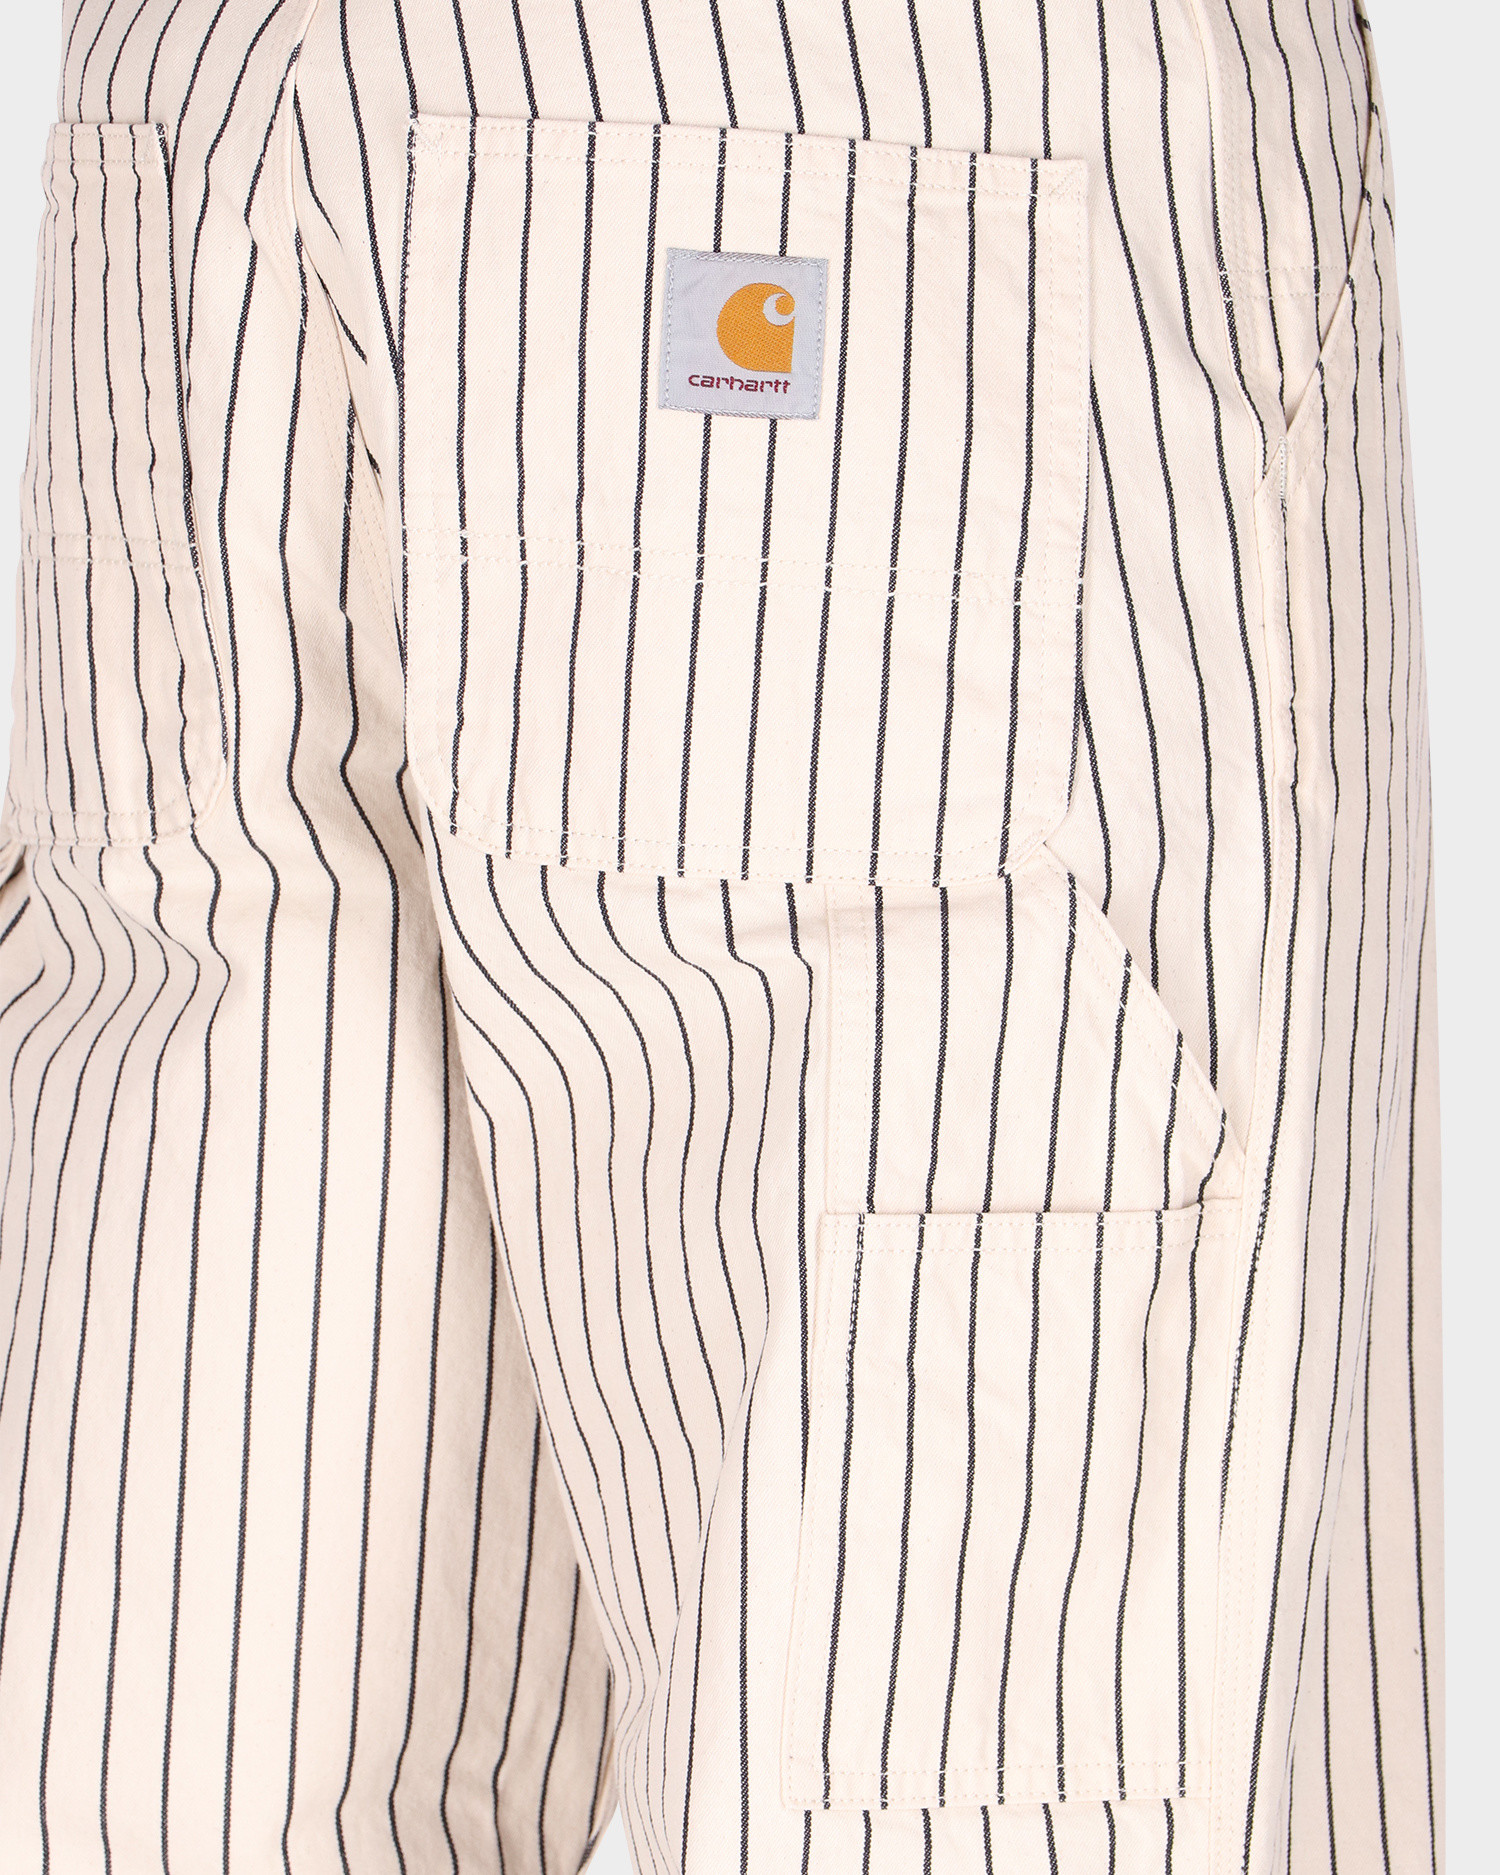 Carhartt Trade Single Knee Pant Cotton Wax/Black Rinsed